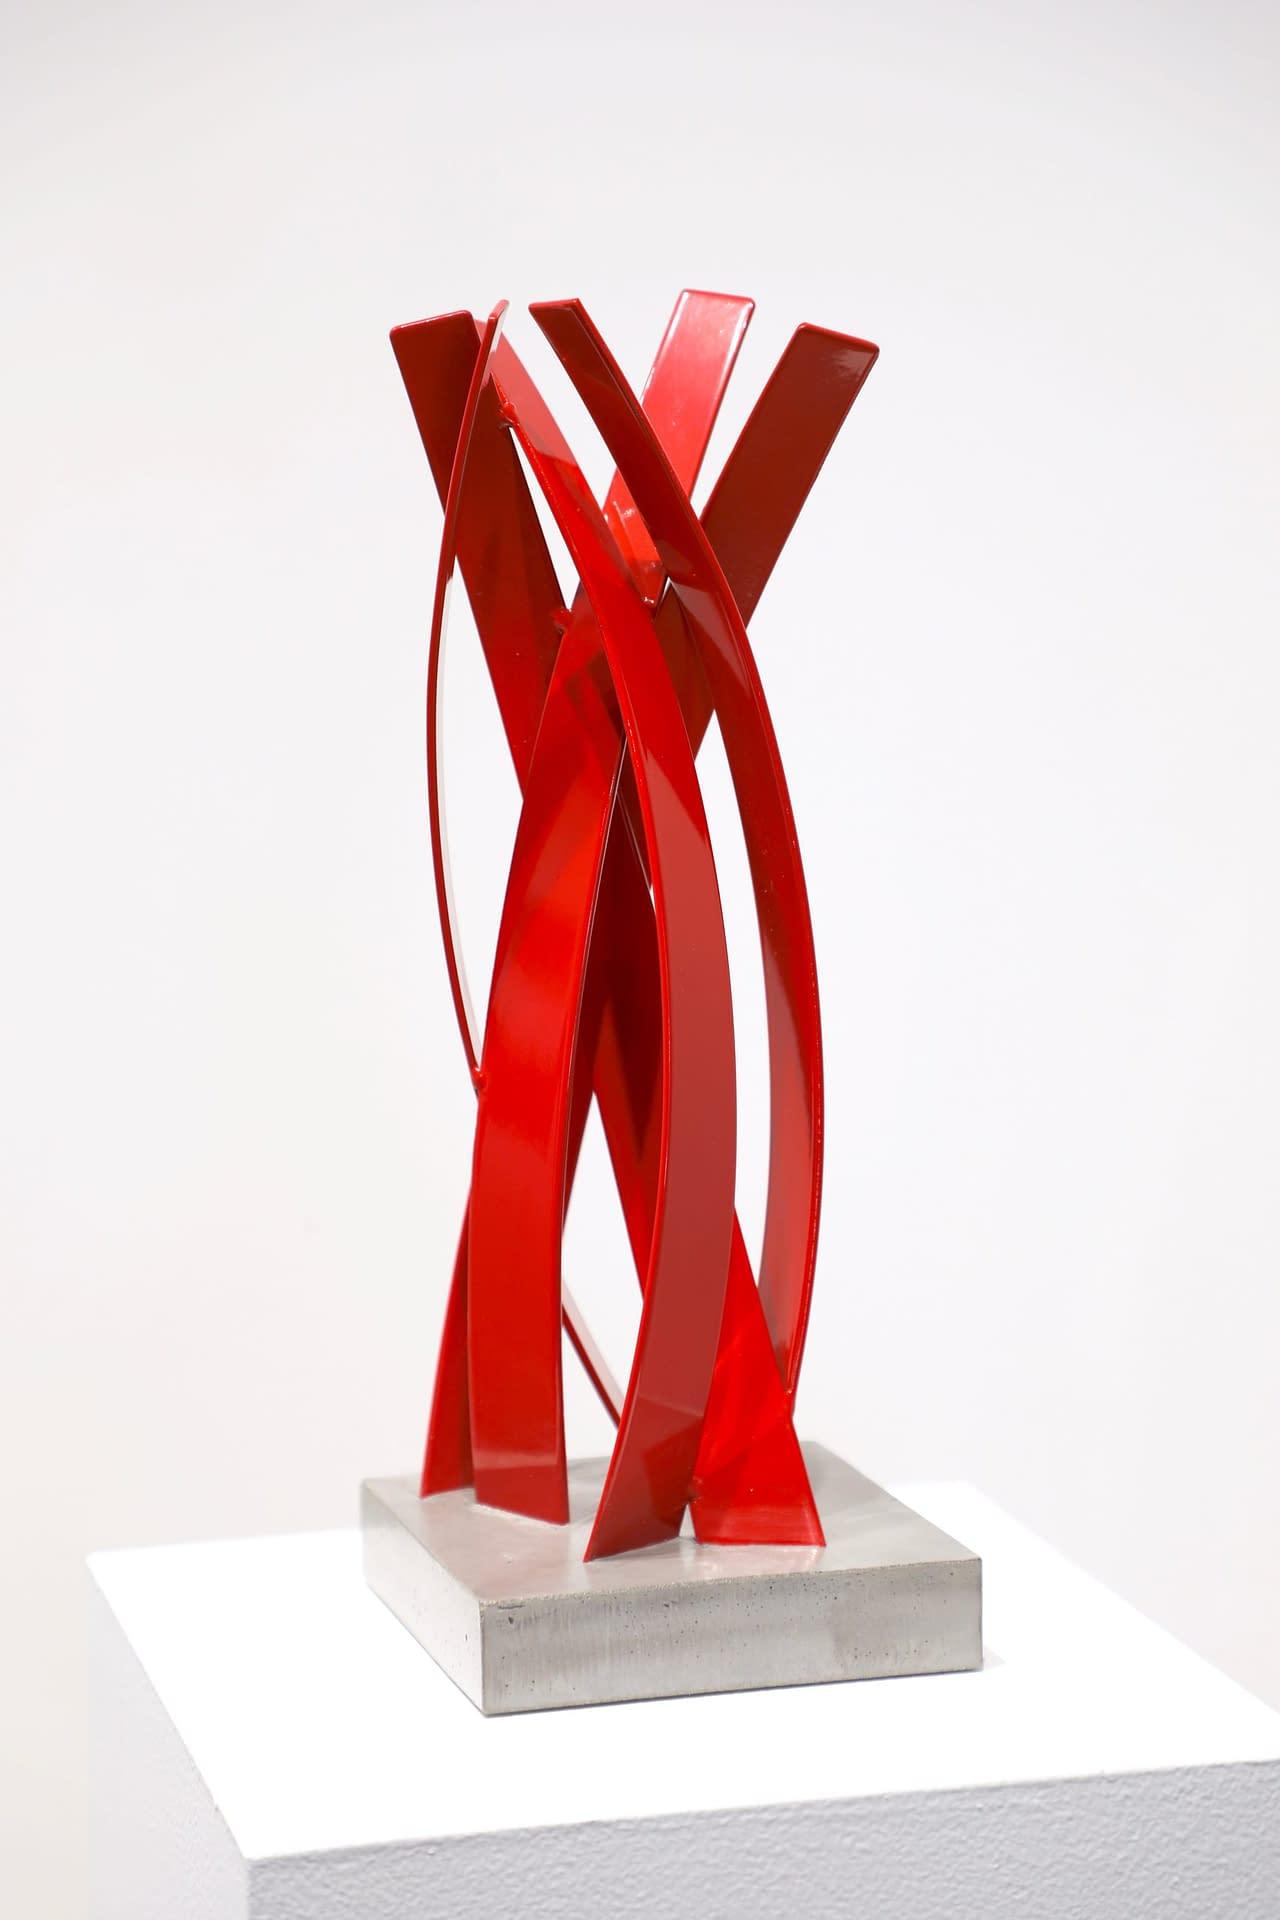 matt devine, sculpture, study, steel with powdercoat, red sculpture, abstract sculpture